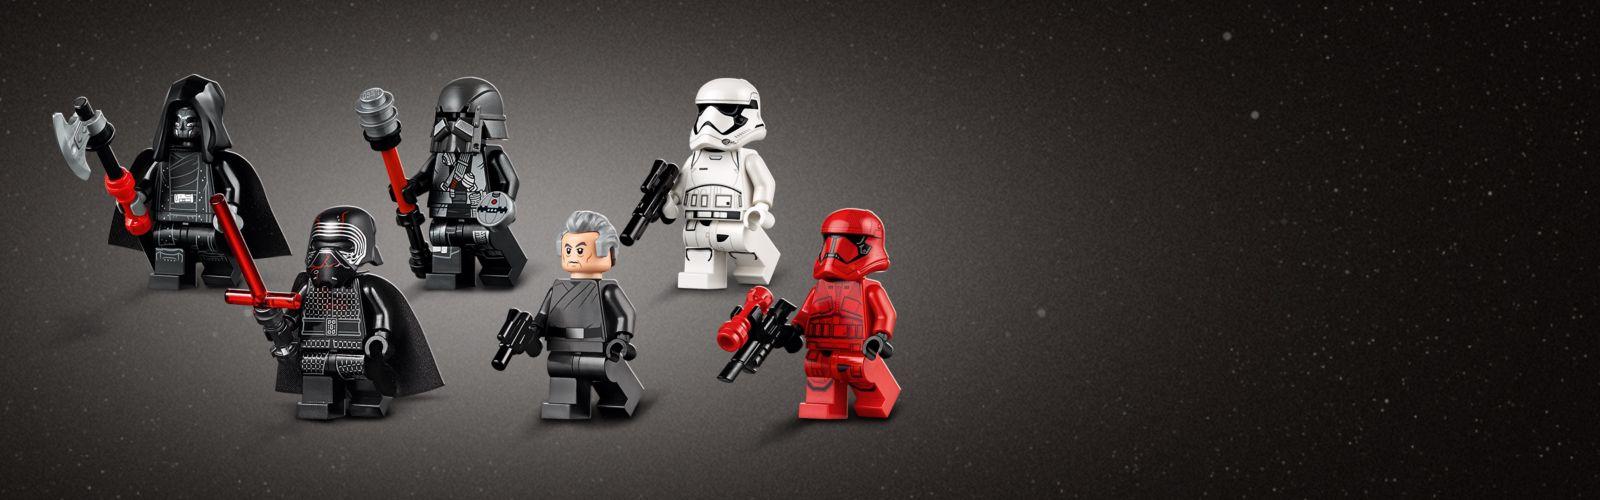 Lego Star Wars Kylo Ren S Shuttle 75256